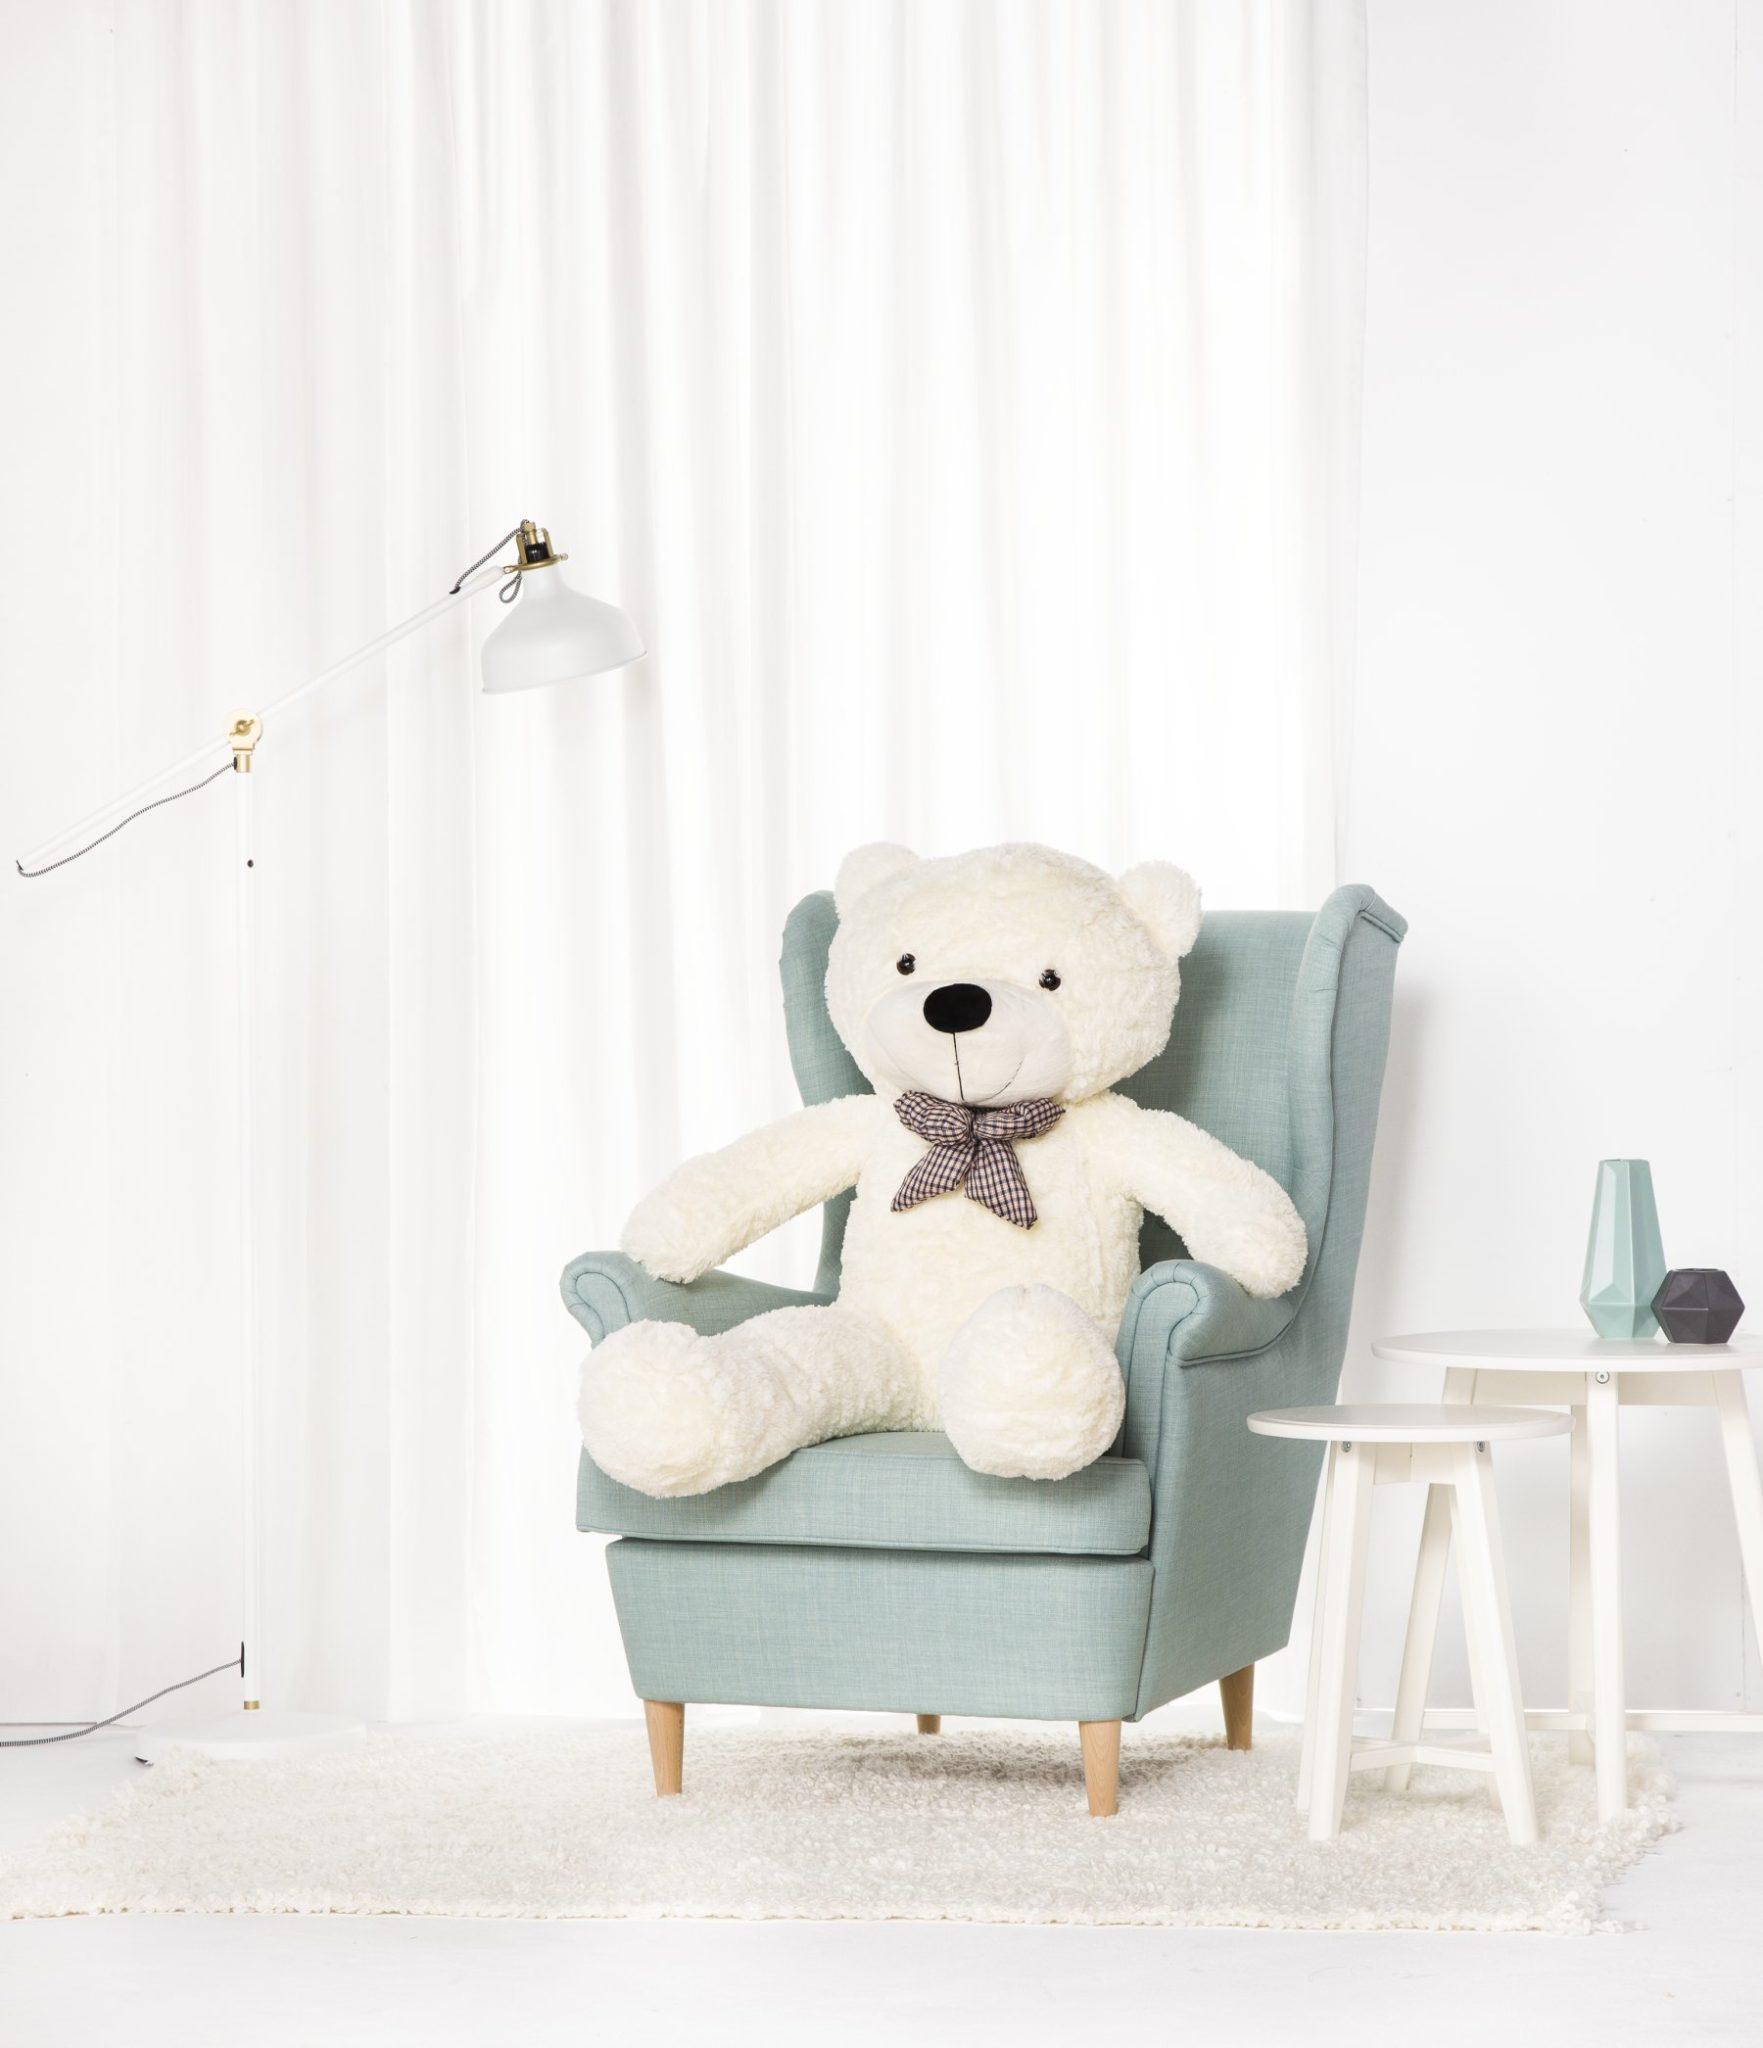 Velký plyšový medvěd Classico XL 130 cm - bílý